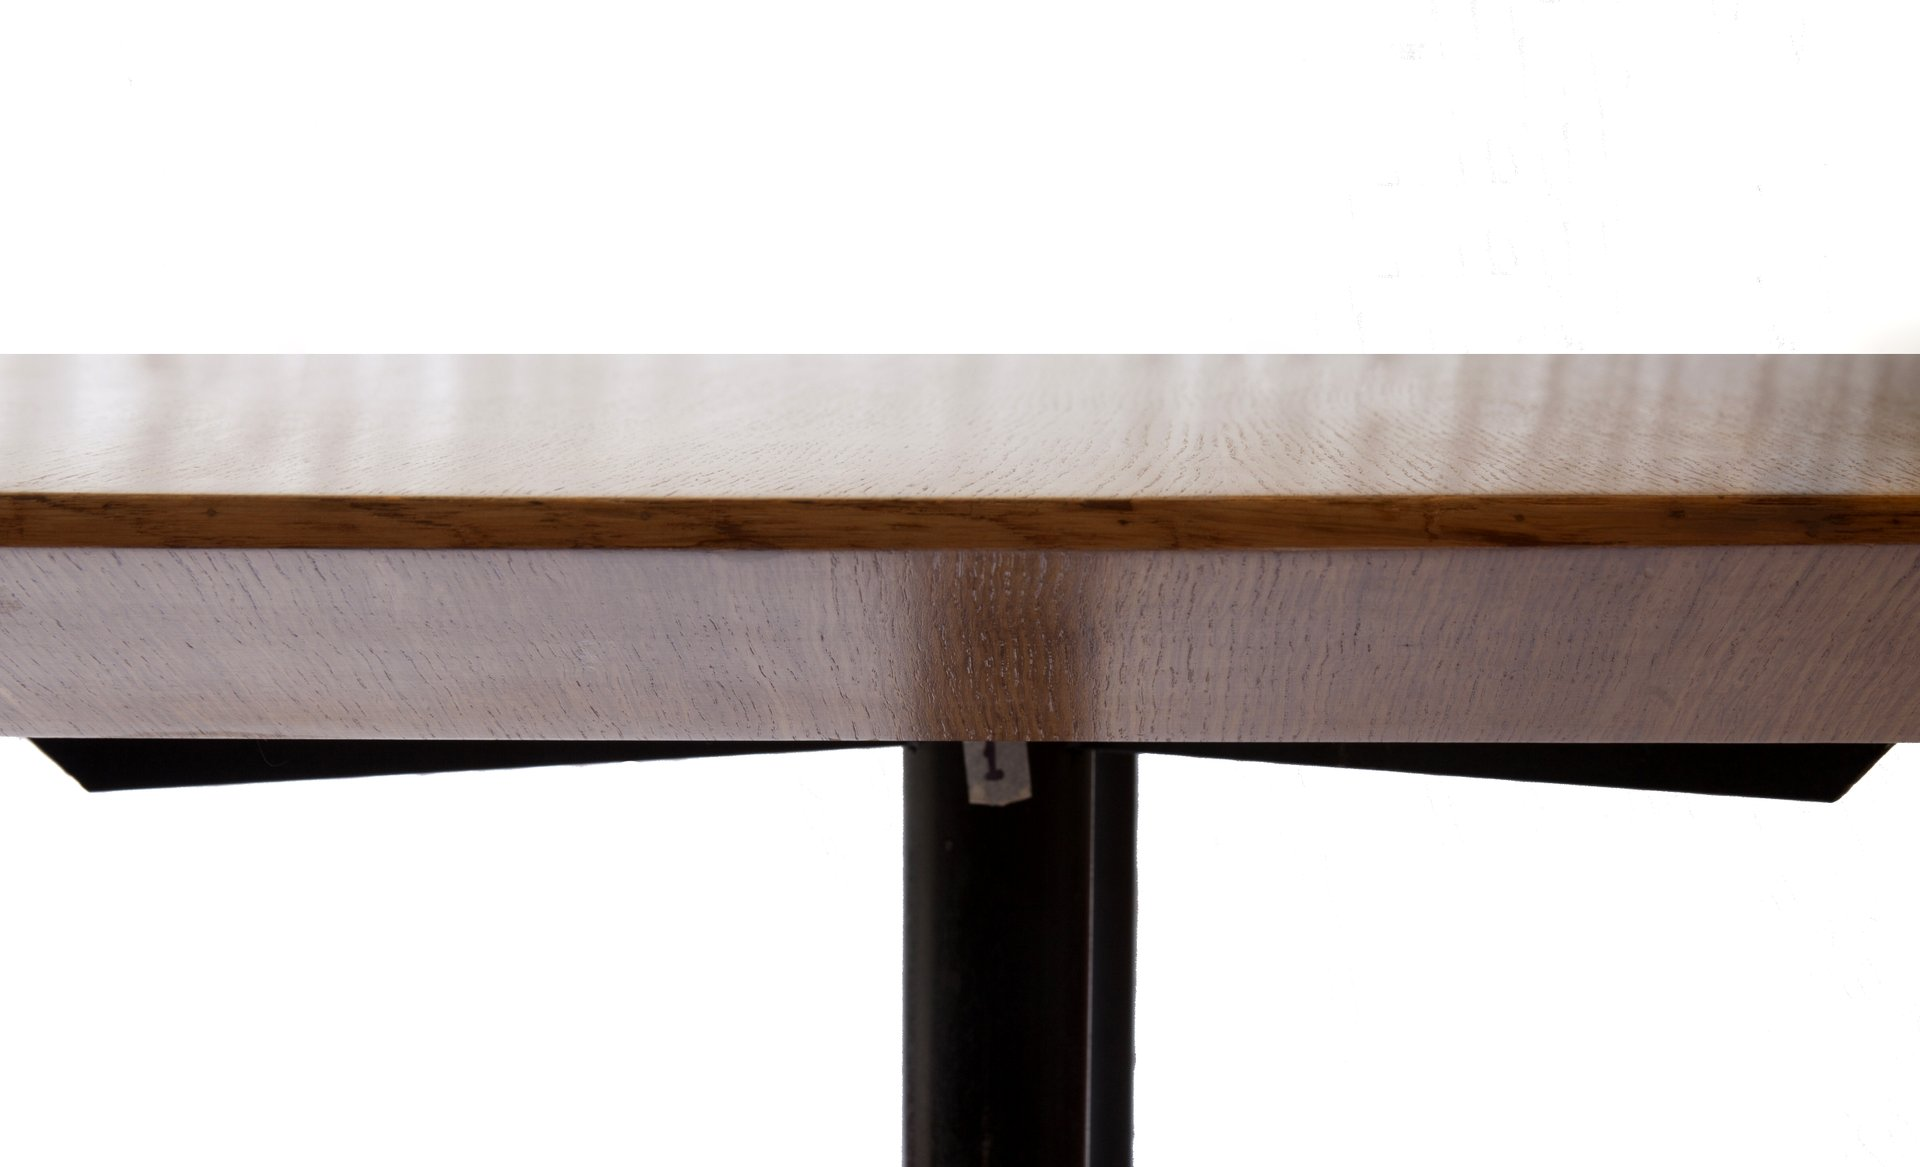 Diamond Dining Table by Gio Ponti 1960s for sale at Pamono